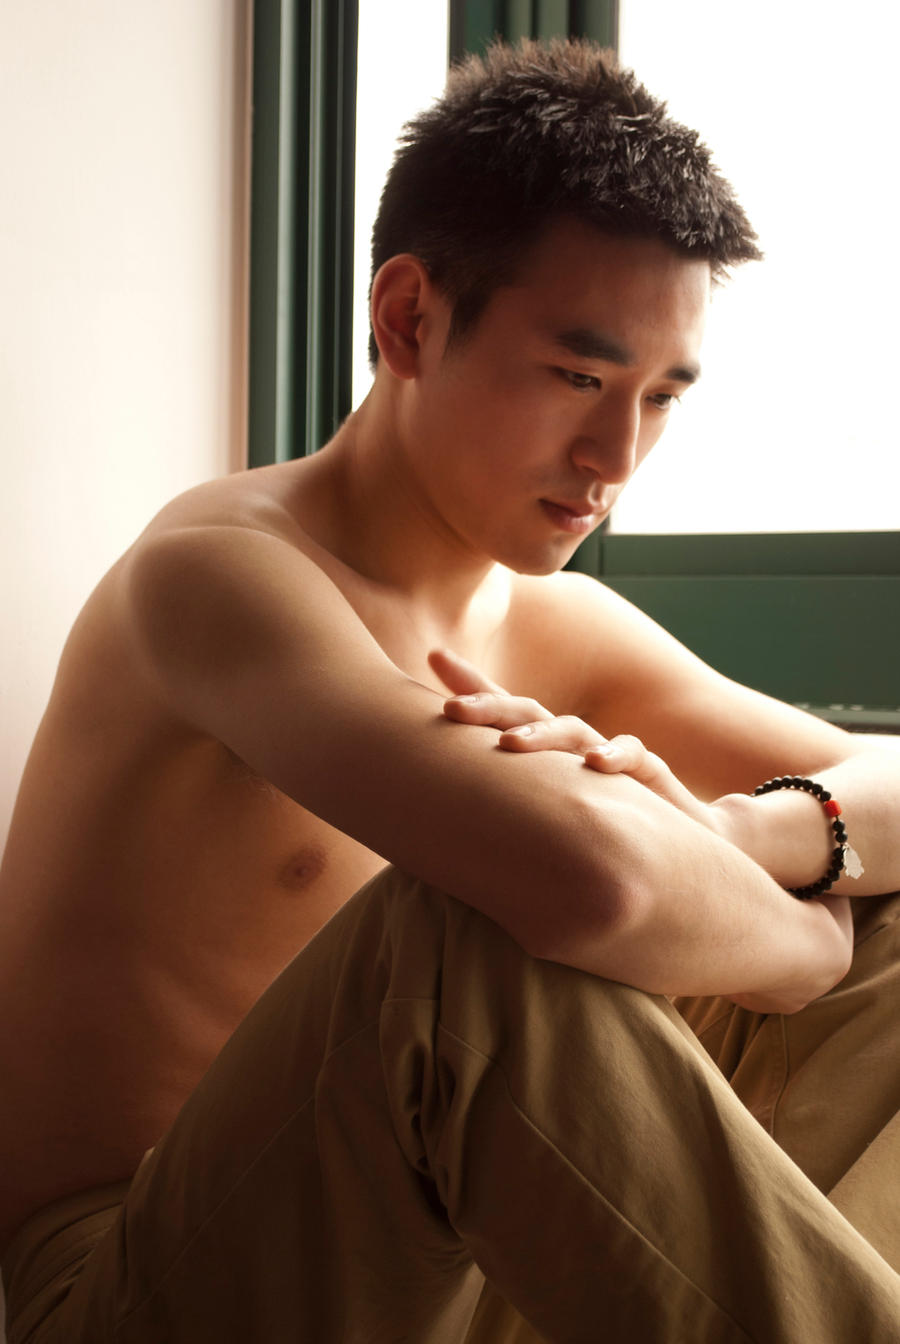 Ryan in Shanghai 3 by Patrykccc